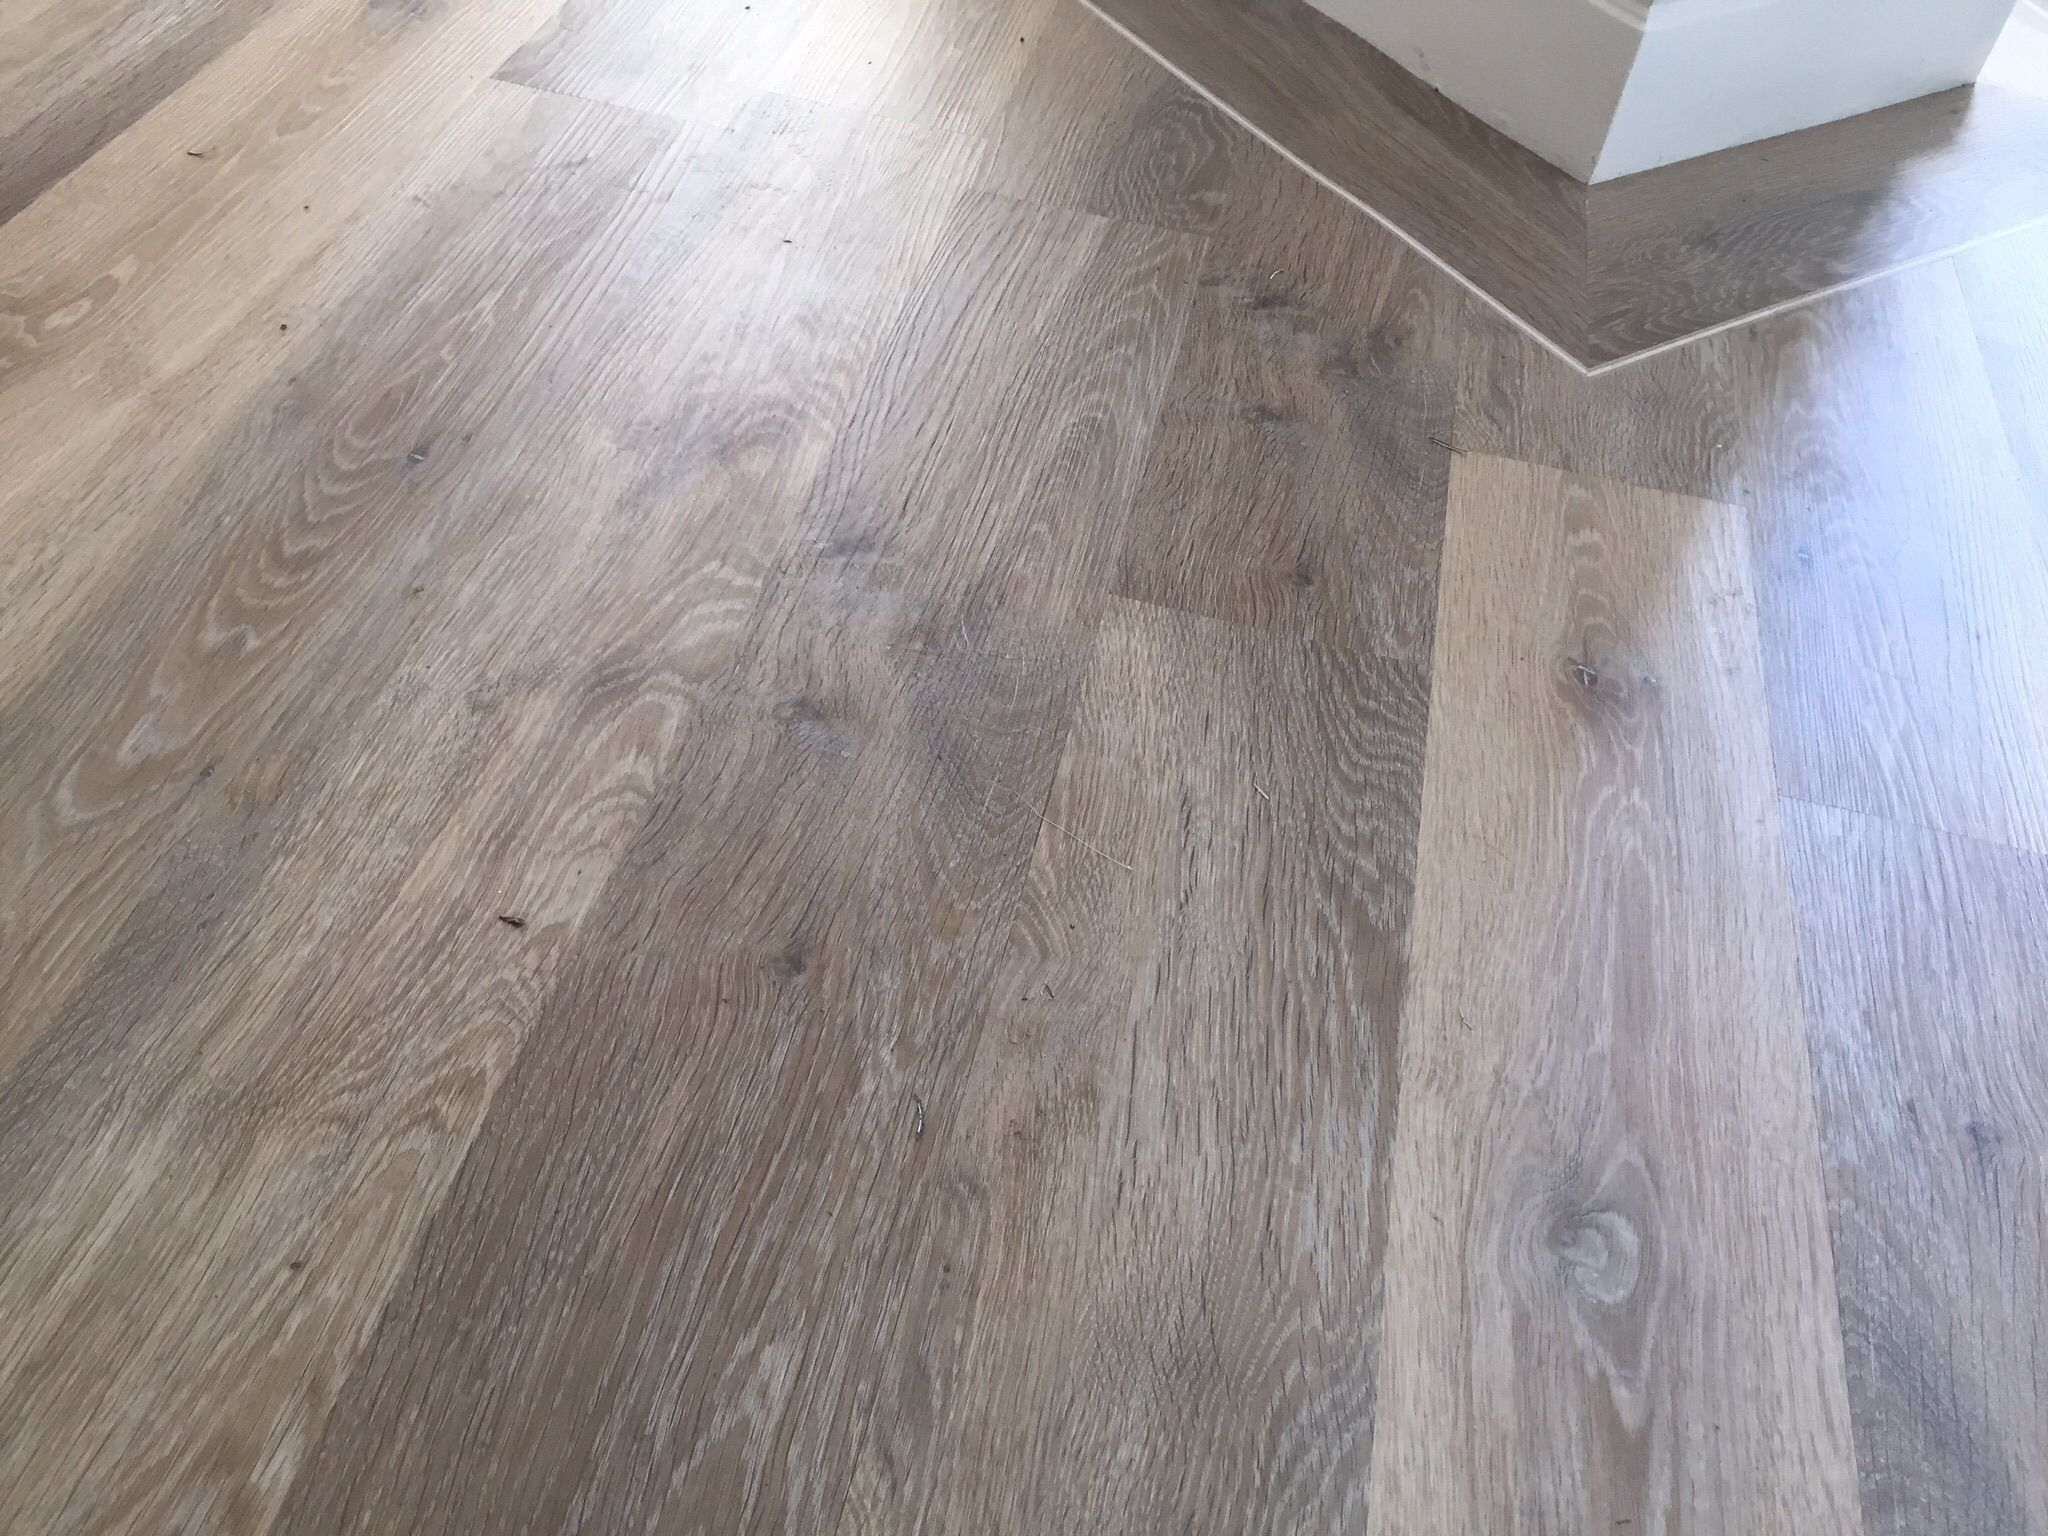 Karndean Knight Tile With Treble Border Charcoal Chalk By Touchwood Flooring Services Unit Redscar Ind Est Preston 07782264647